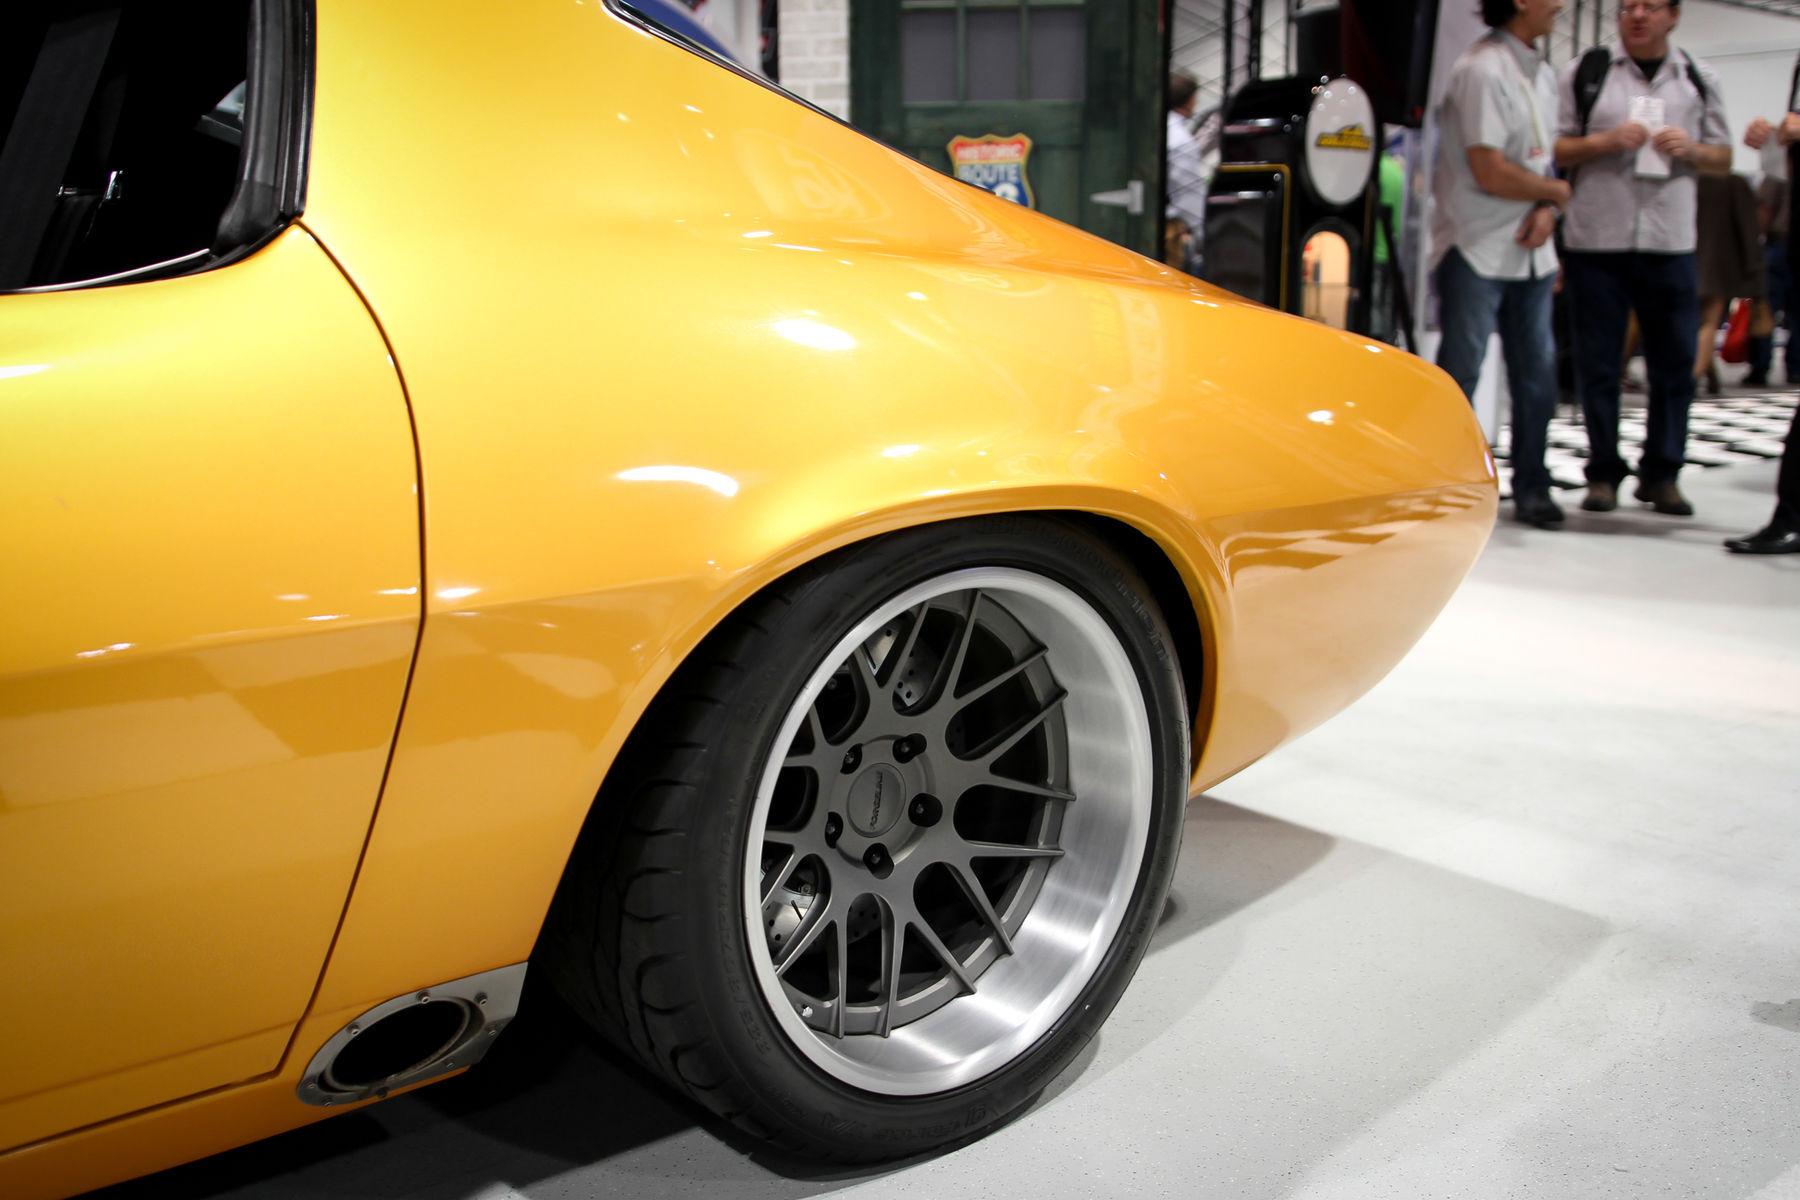 1971 Chevrolet Camaro | Camaro on Forgeline DE3C Wheels